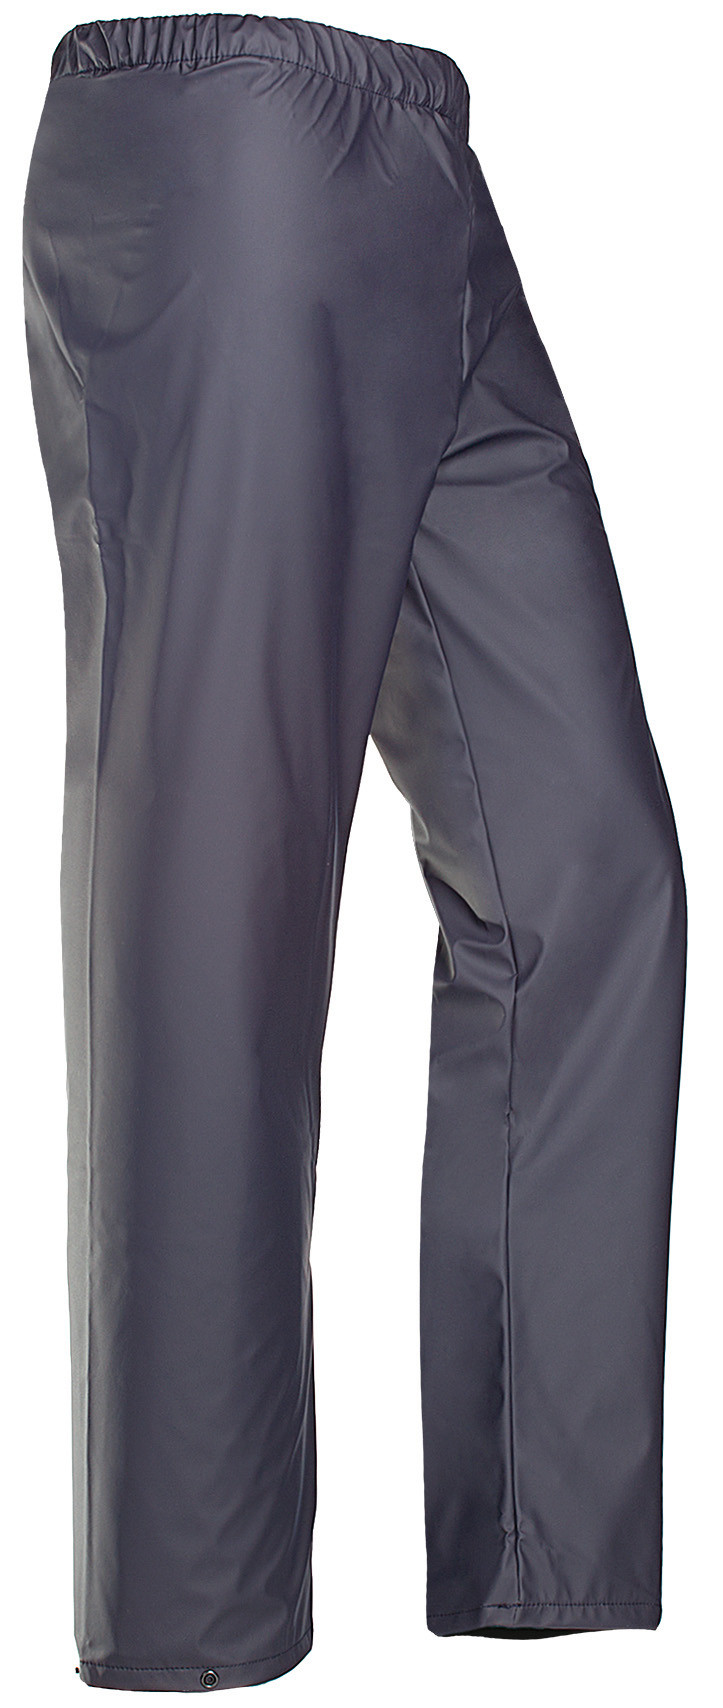 Trouser Navy Flexothane (M) 6360